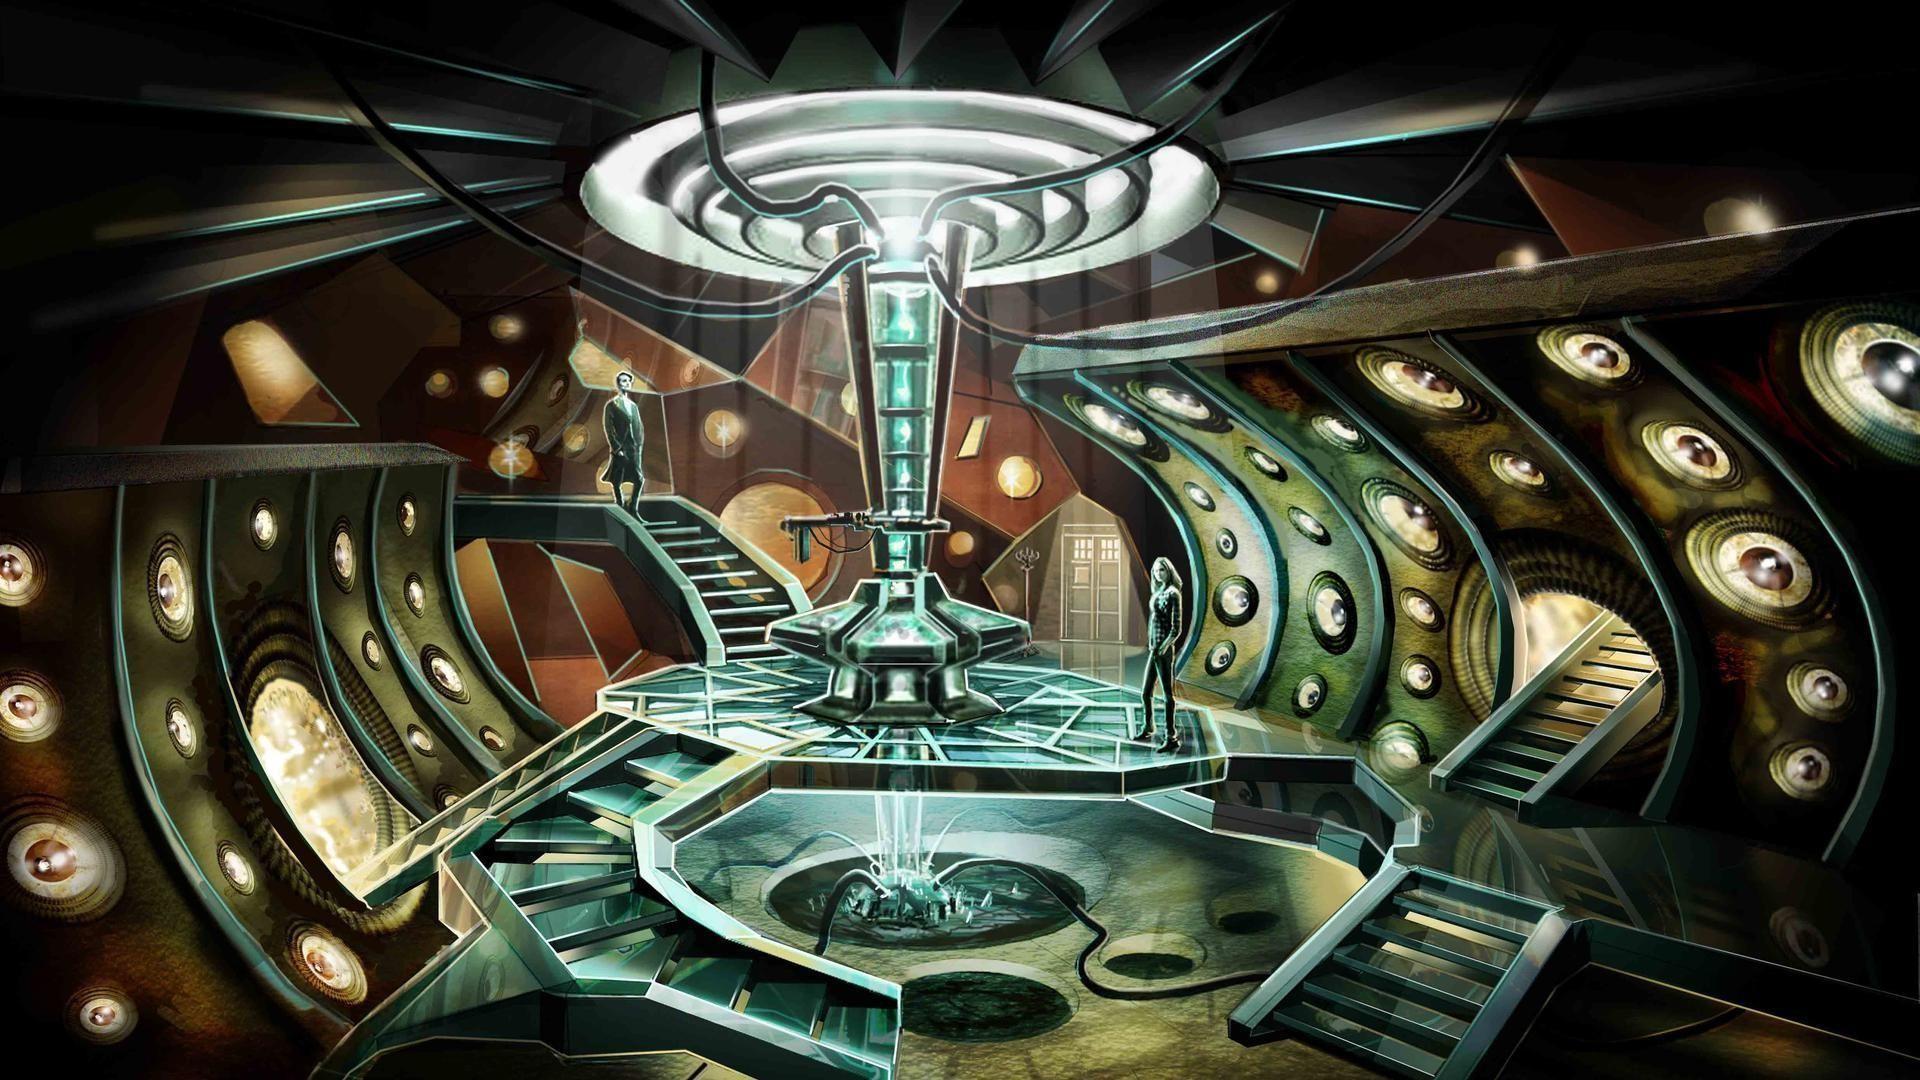 Doctor Who Tardis doctor who Games TARDIS HD Wallpapers, Desktop .